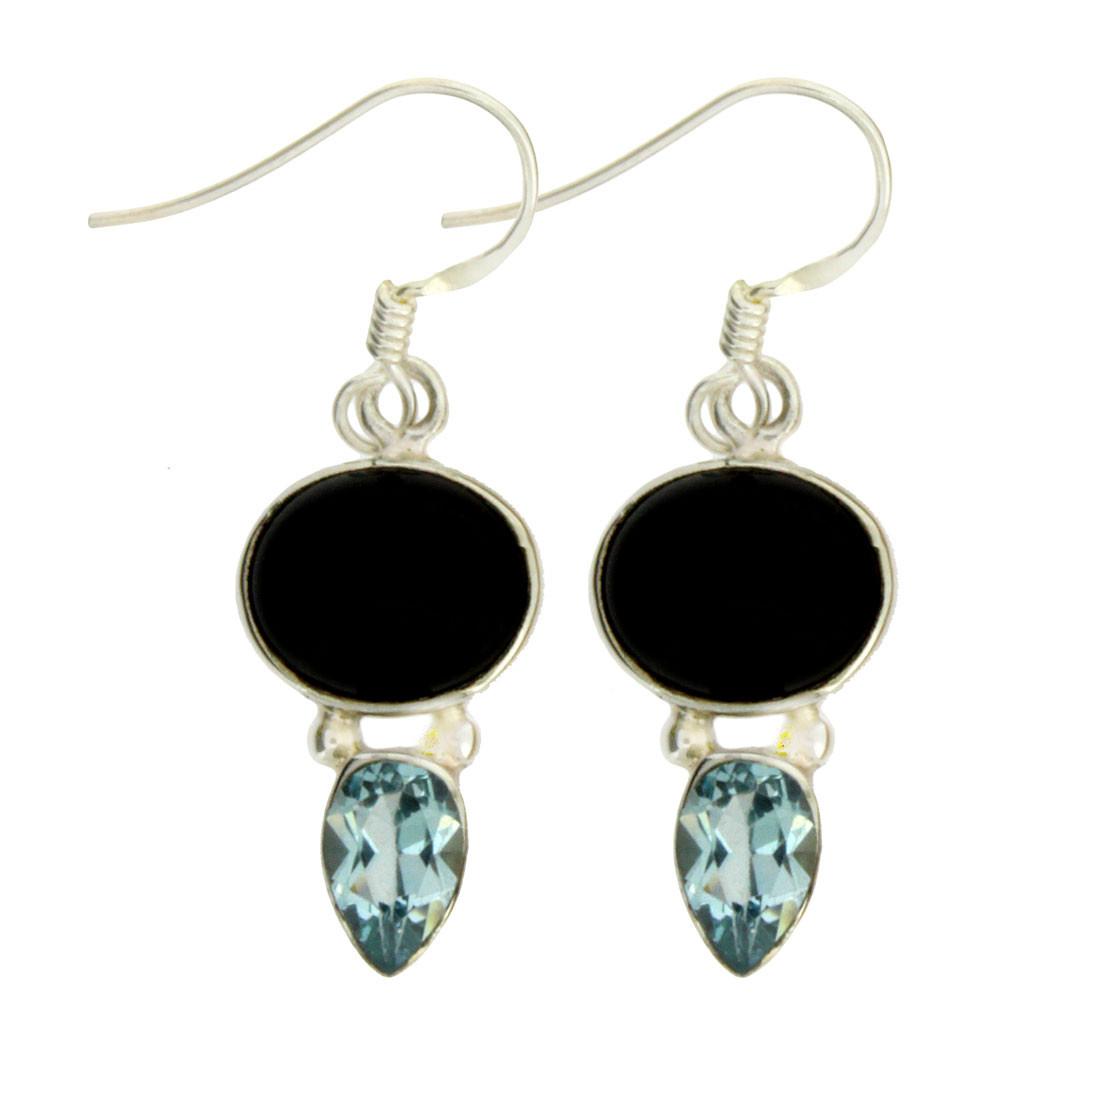 Black Onyx and Blue Topaz Sterling Silver Dangle Earrings